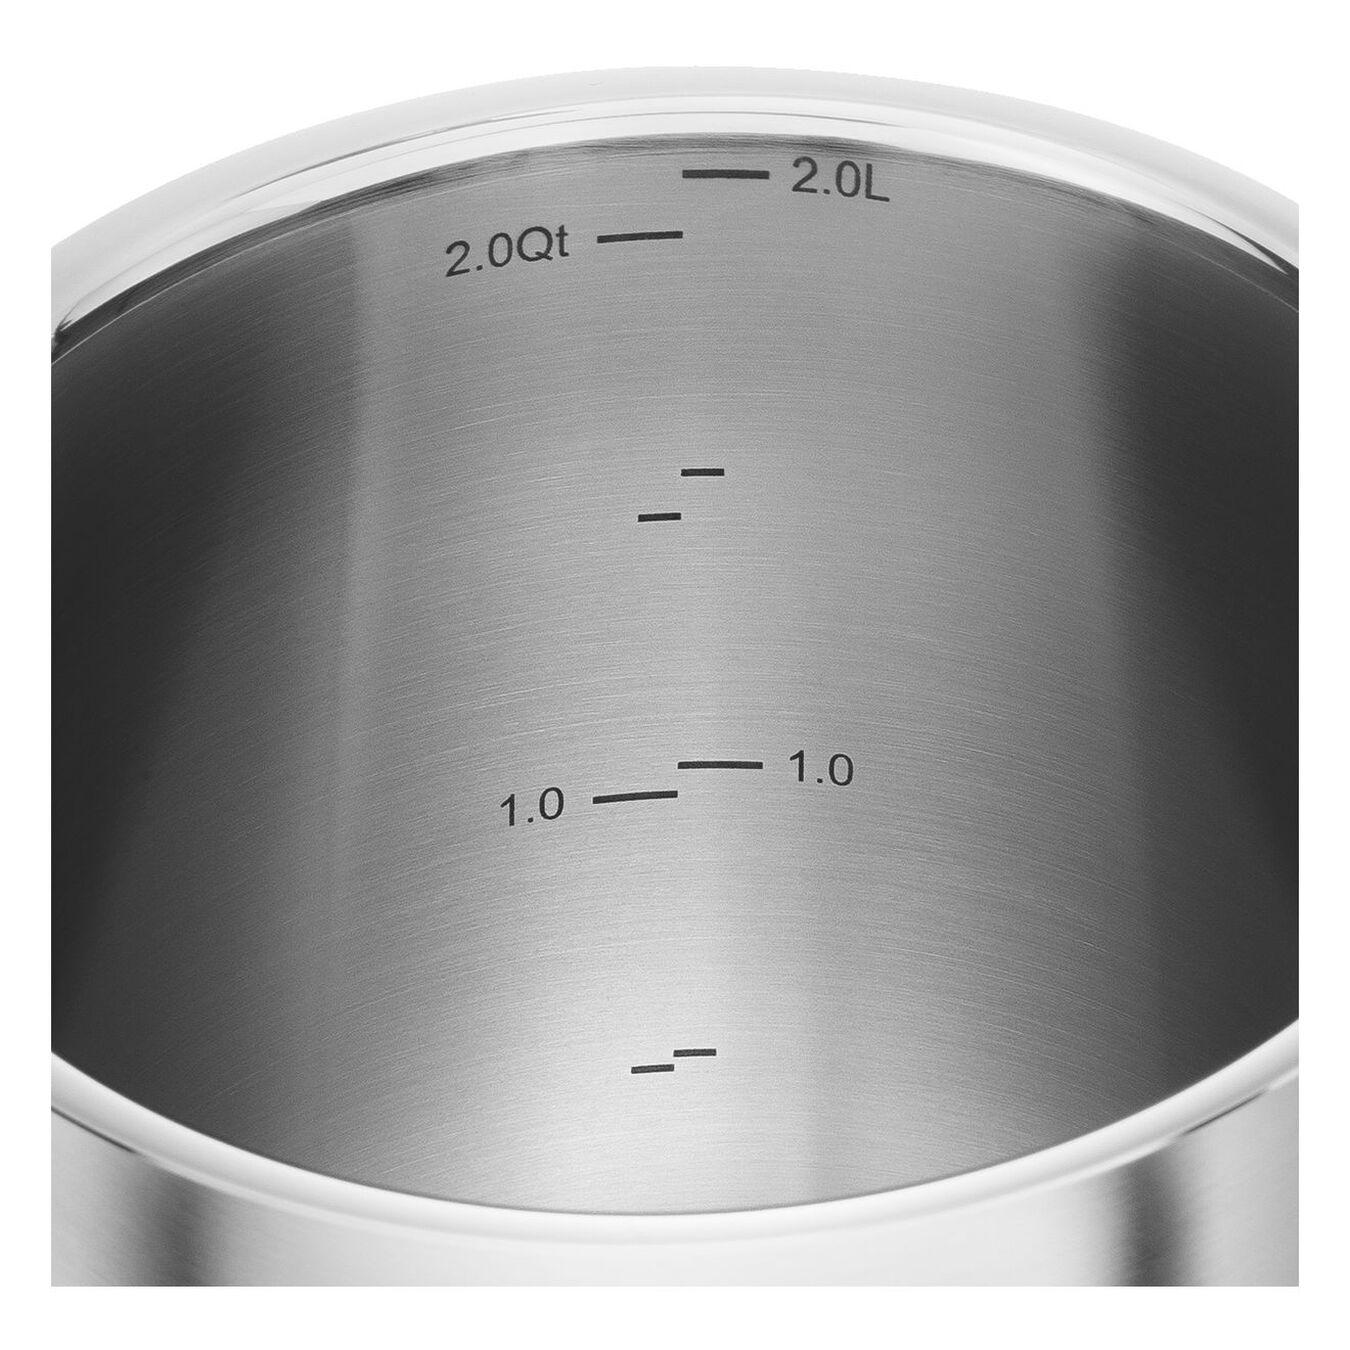 Milchtopf 14 cm, 18/10 Edelstahl,,large 4